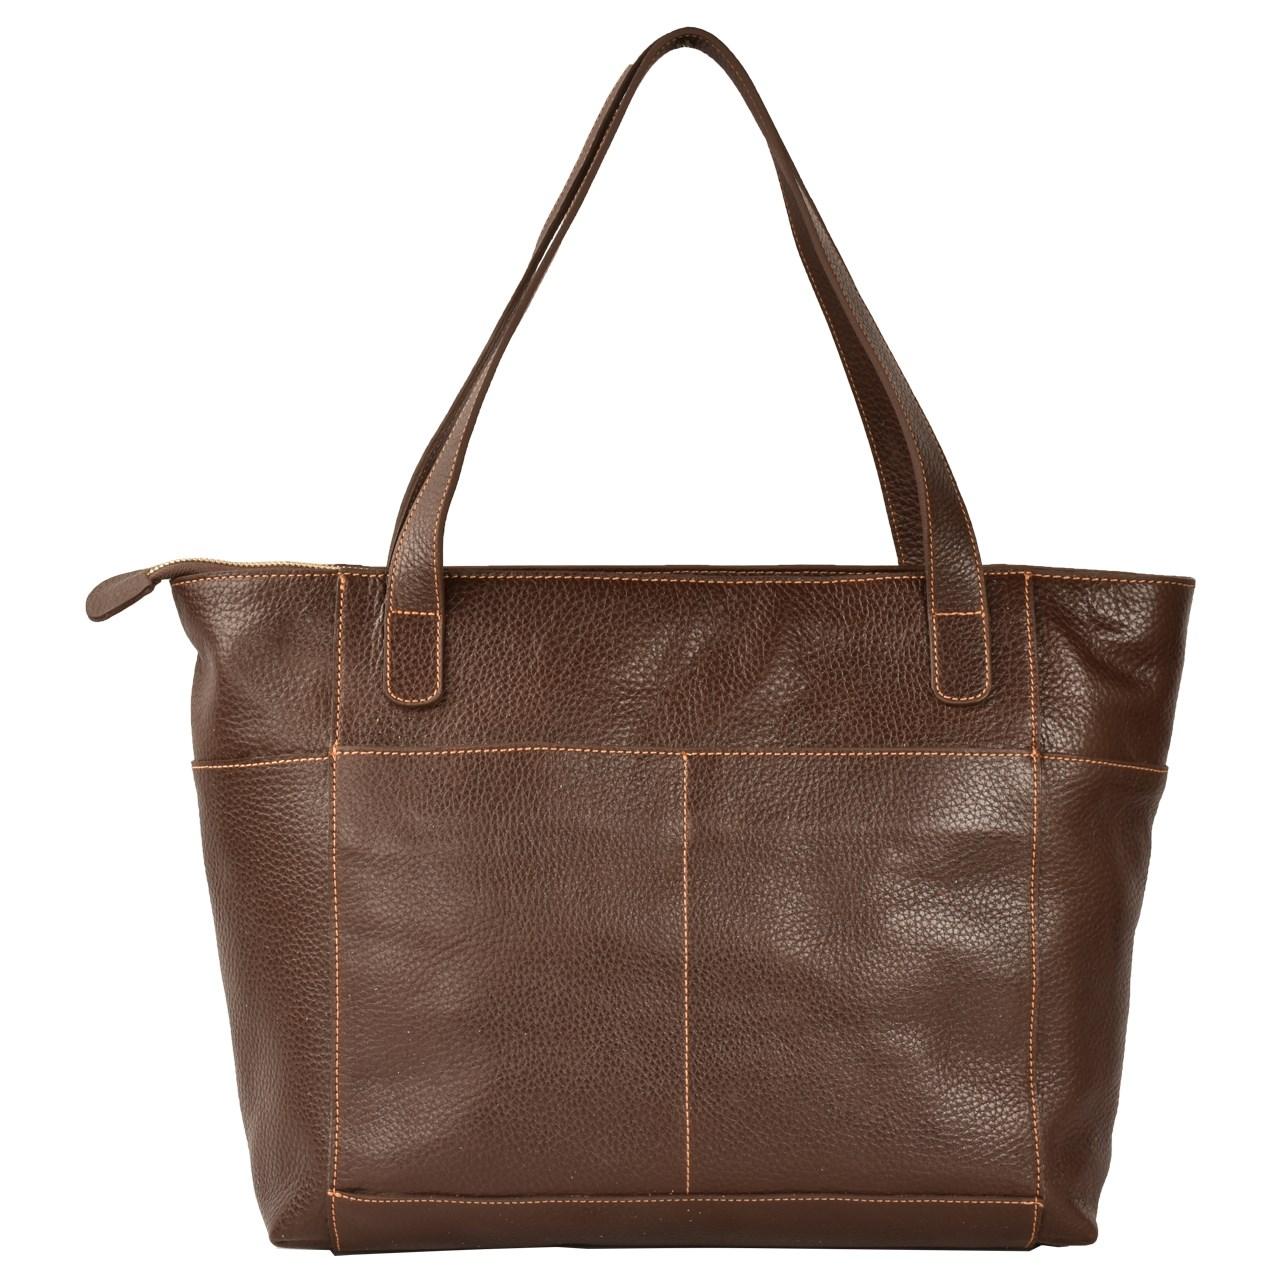 کیف دستی چرم طبیعی کهن چرم مدل V156-7